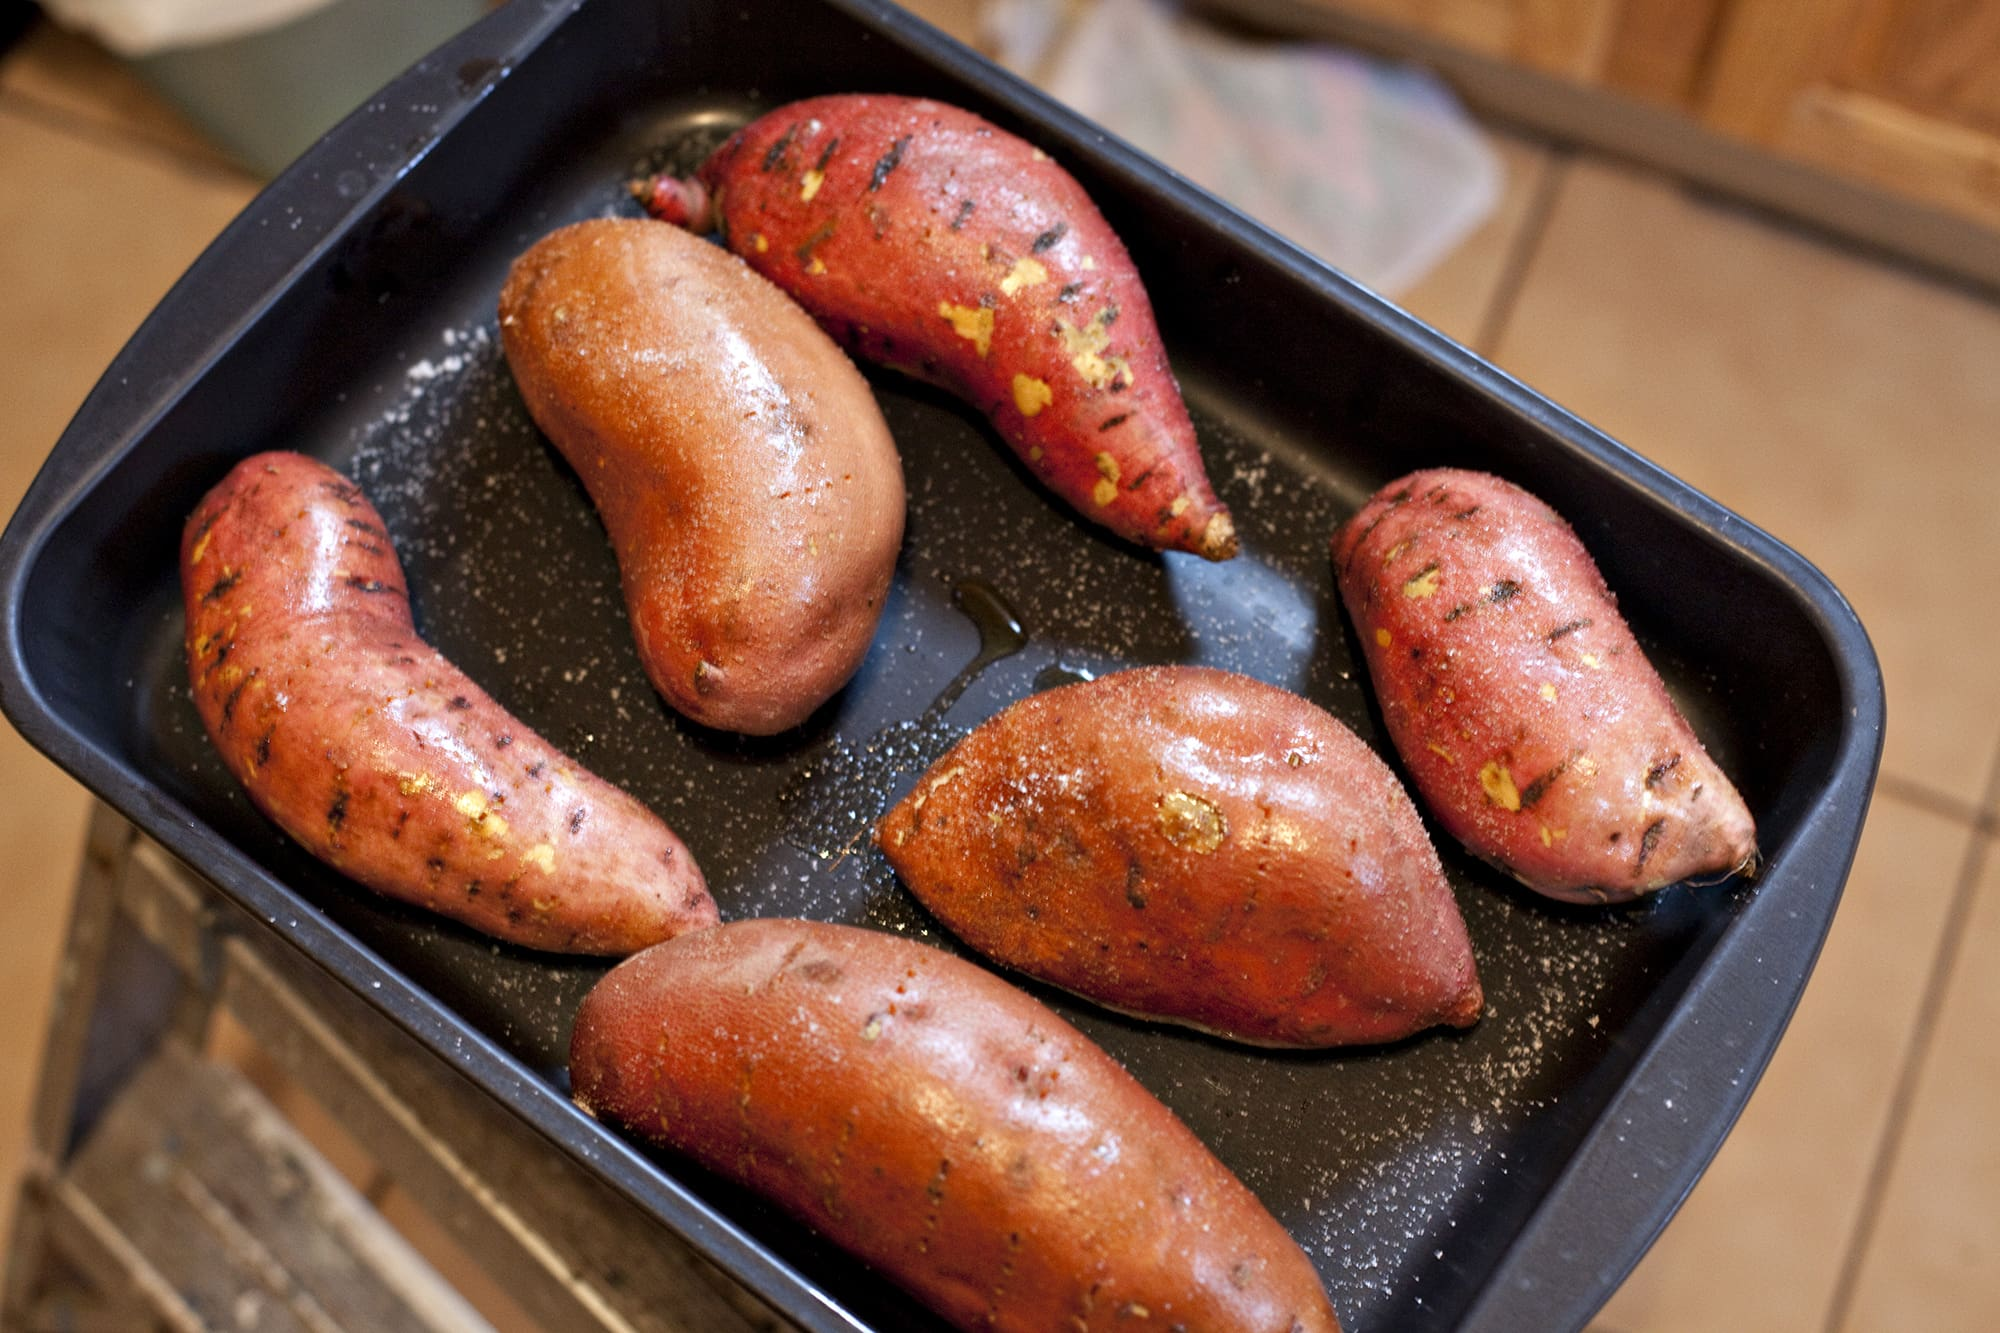 Cooking Thanksgiving Dinner - Sweet Potatoes